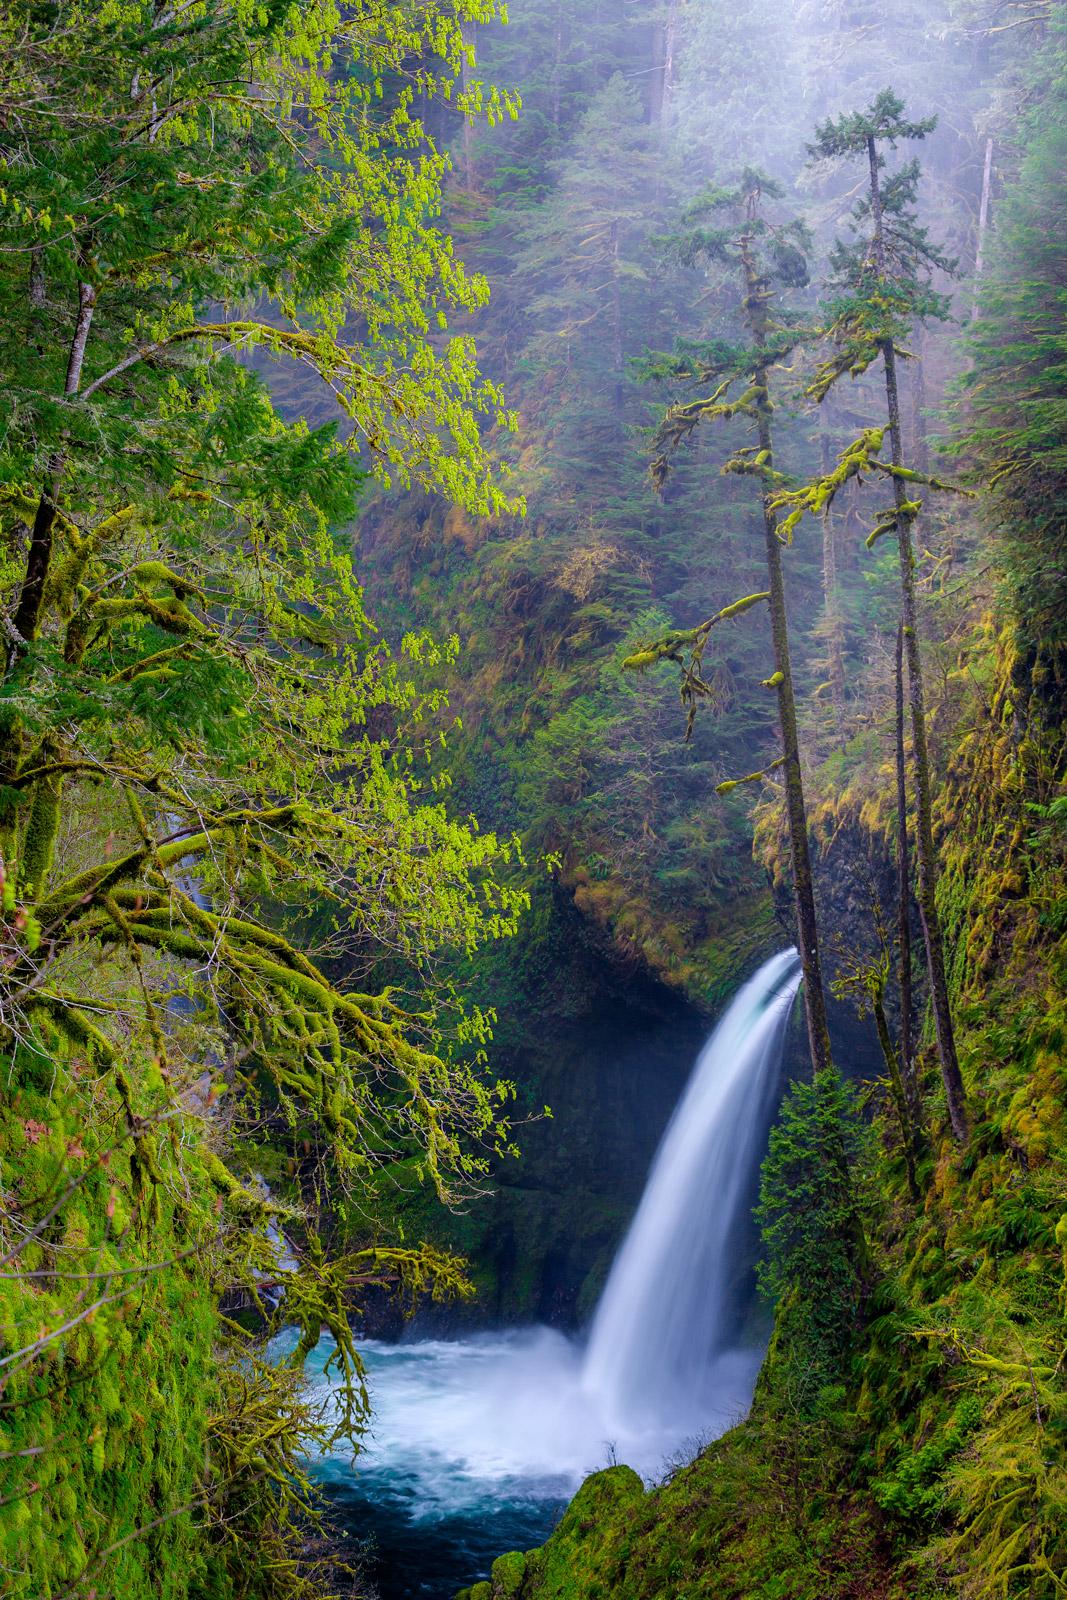 Oregon, Metlako Falls, Waterfall, Columbia River, Gorge, limited edition, photograph, fine art, landscape, photo